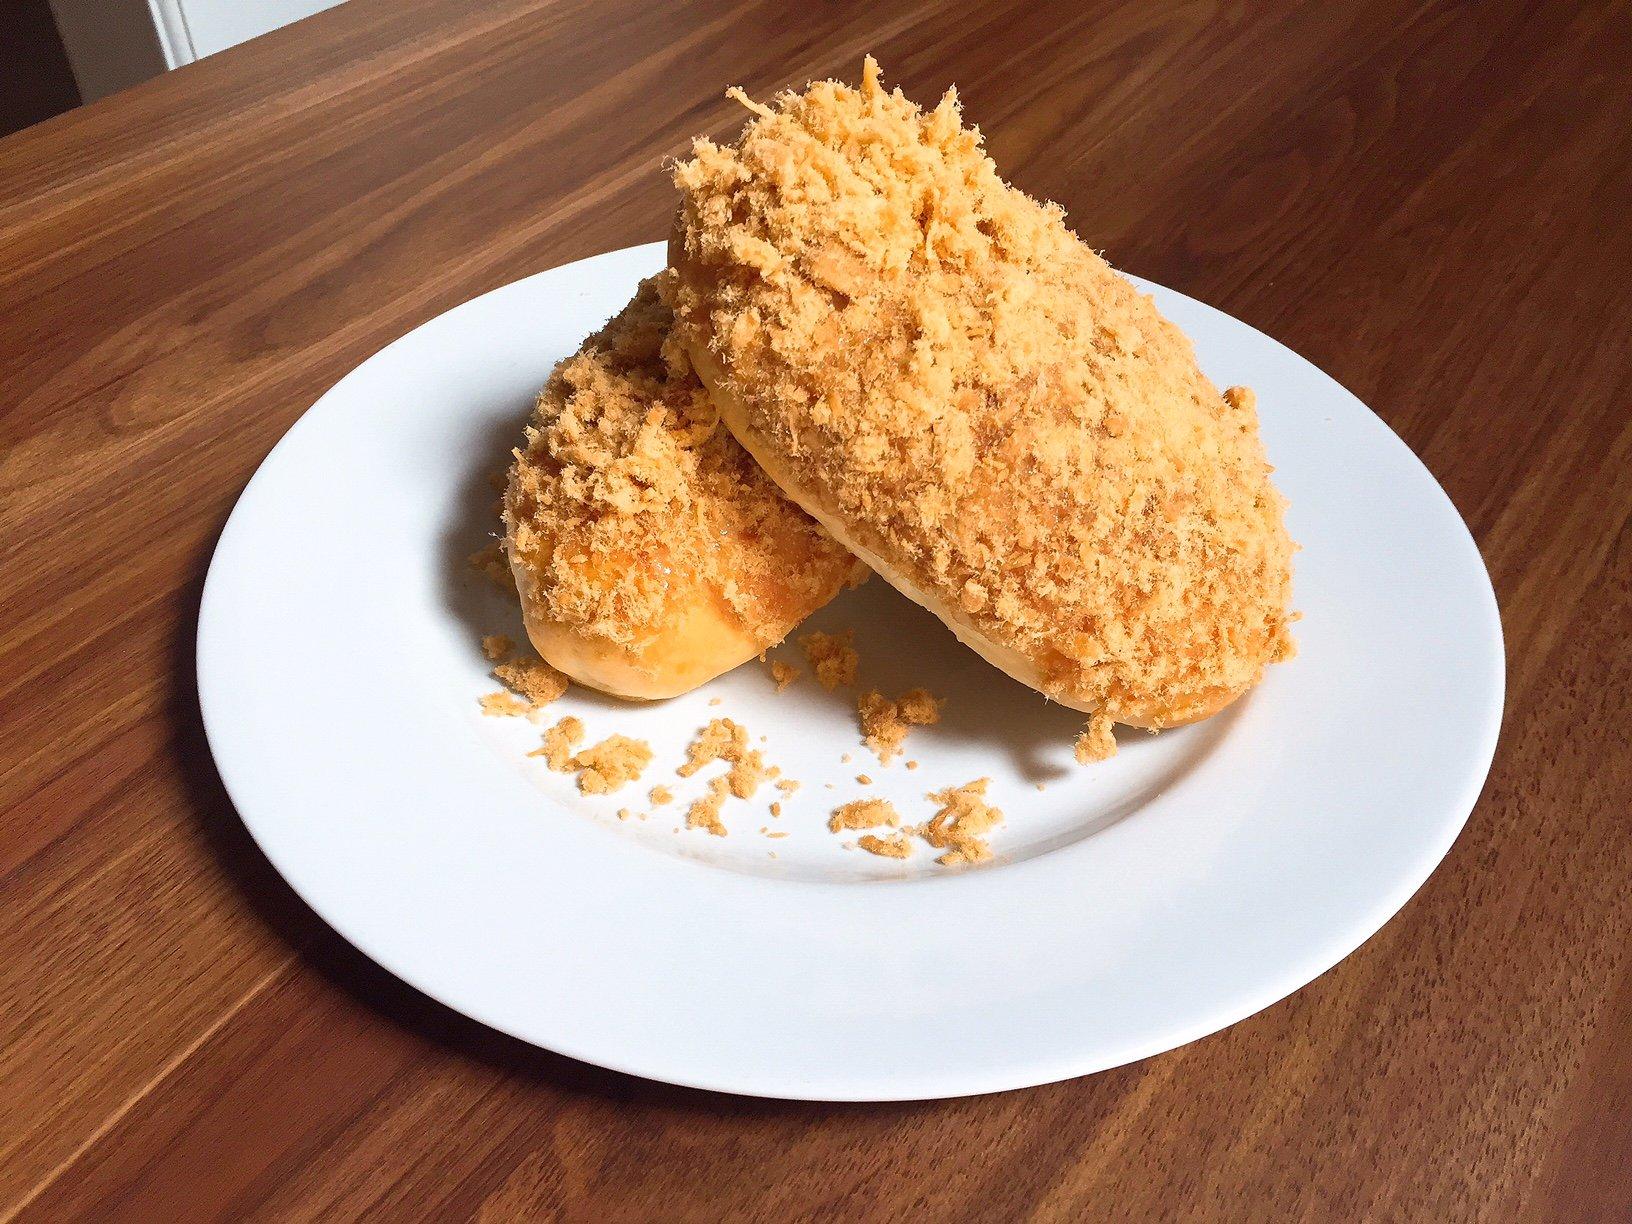 Resep Membuat Roti Abon Ayam